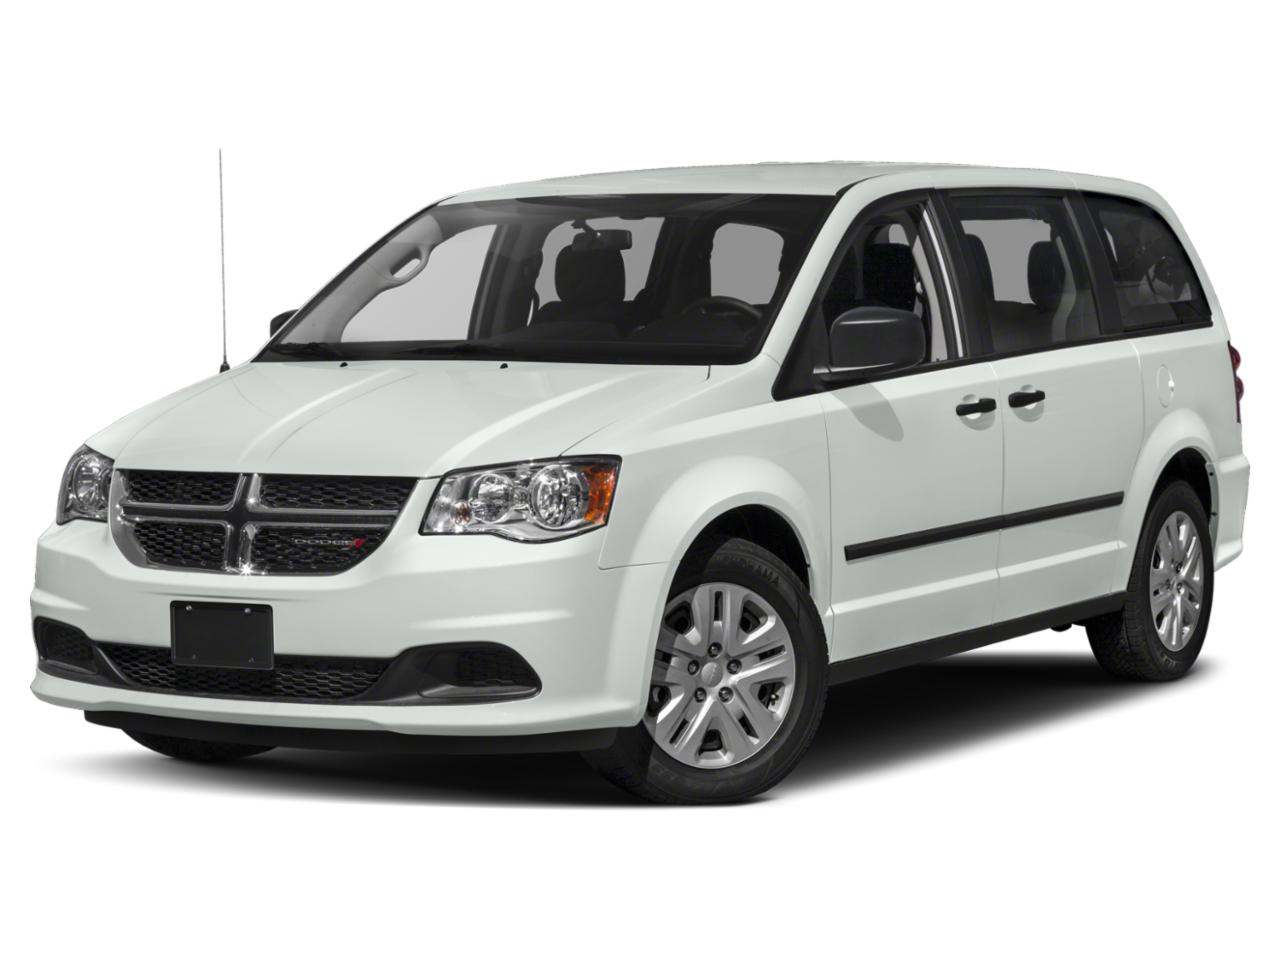 2020 Dodge Grand Caravan Vehicle Photo in APPLETON, WI 54914-8833